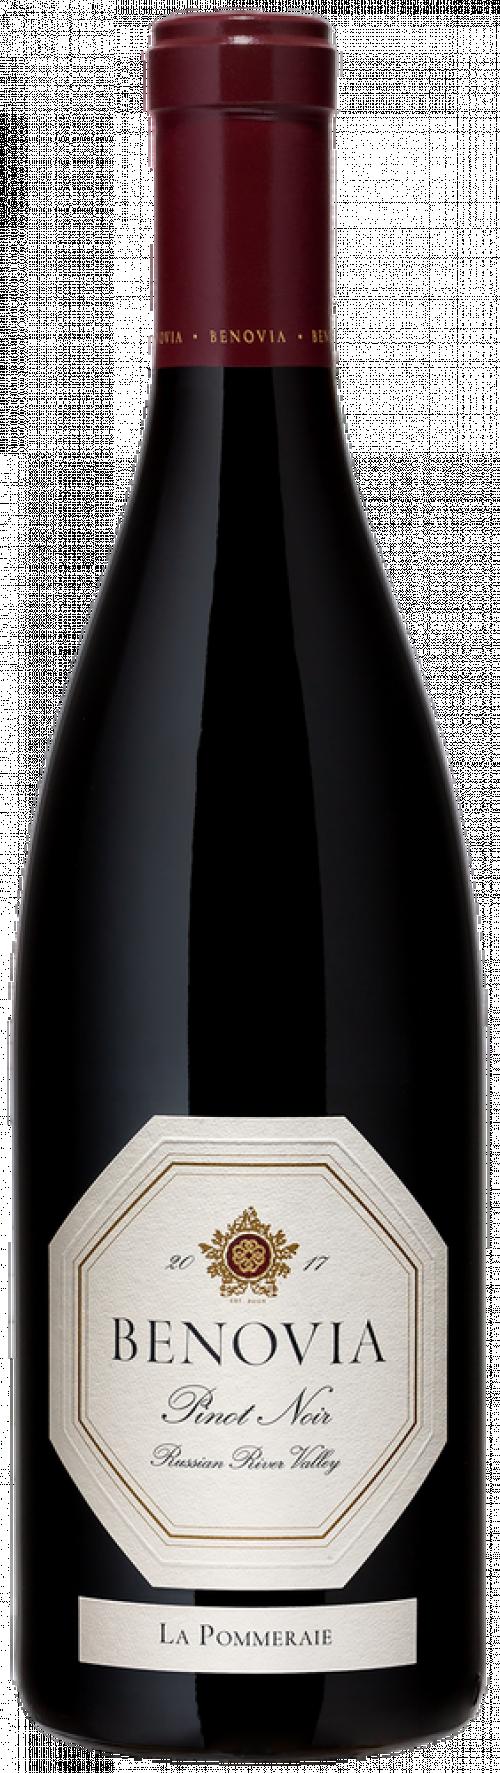 2017 Benovia La Pommeraie Pinot Noir 750ml